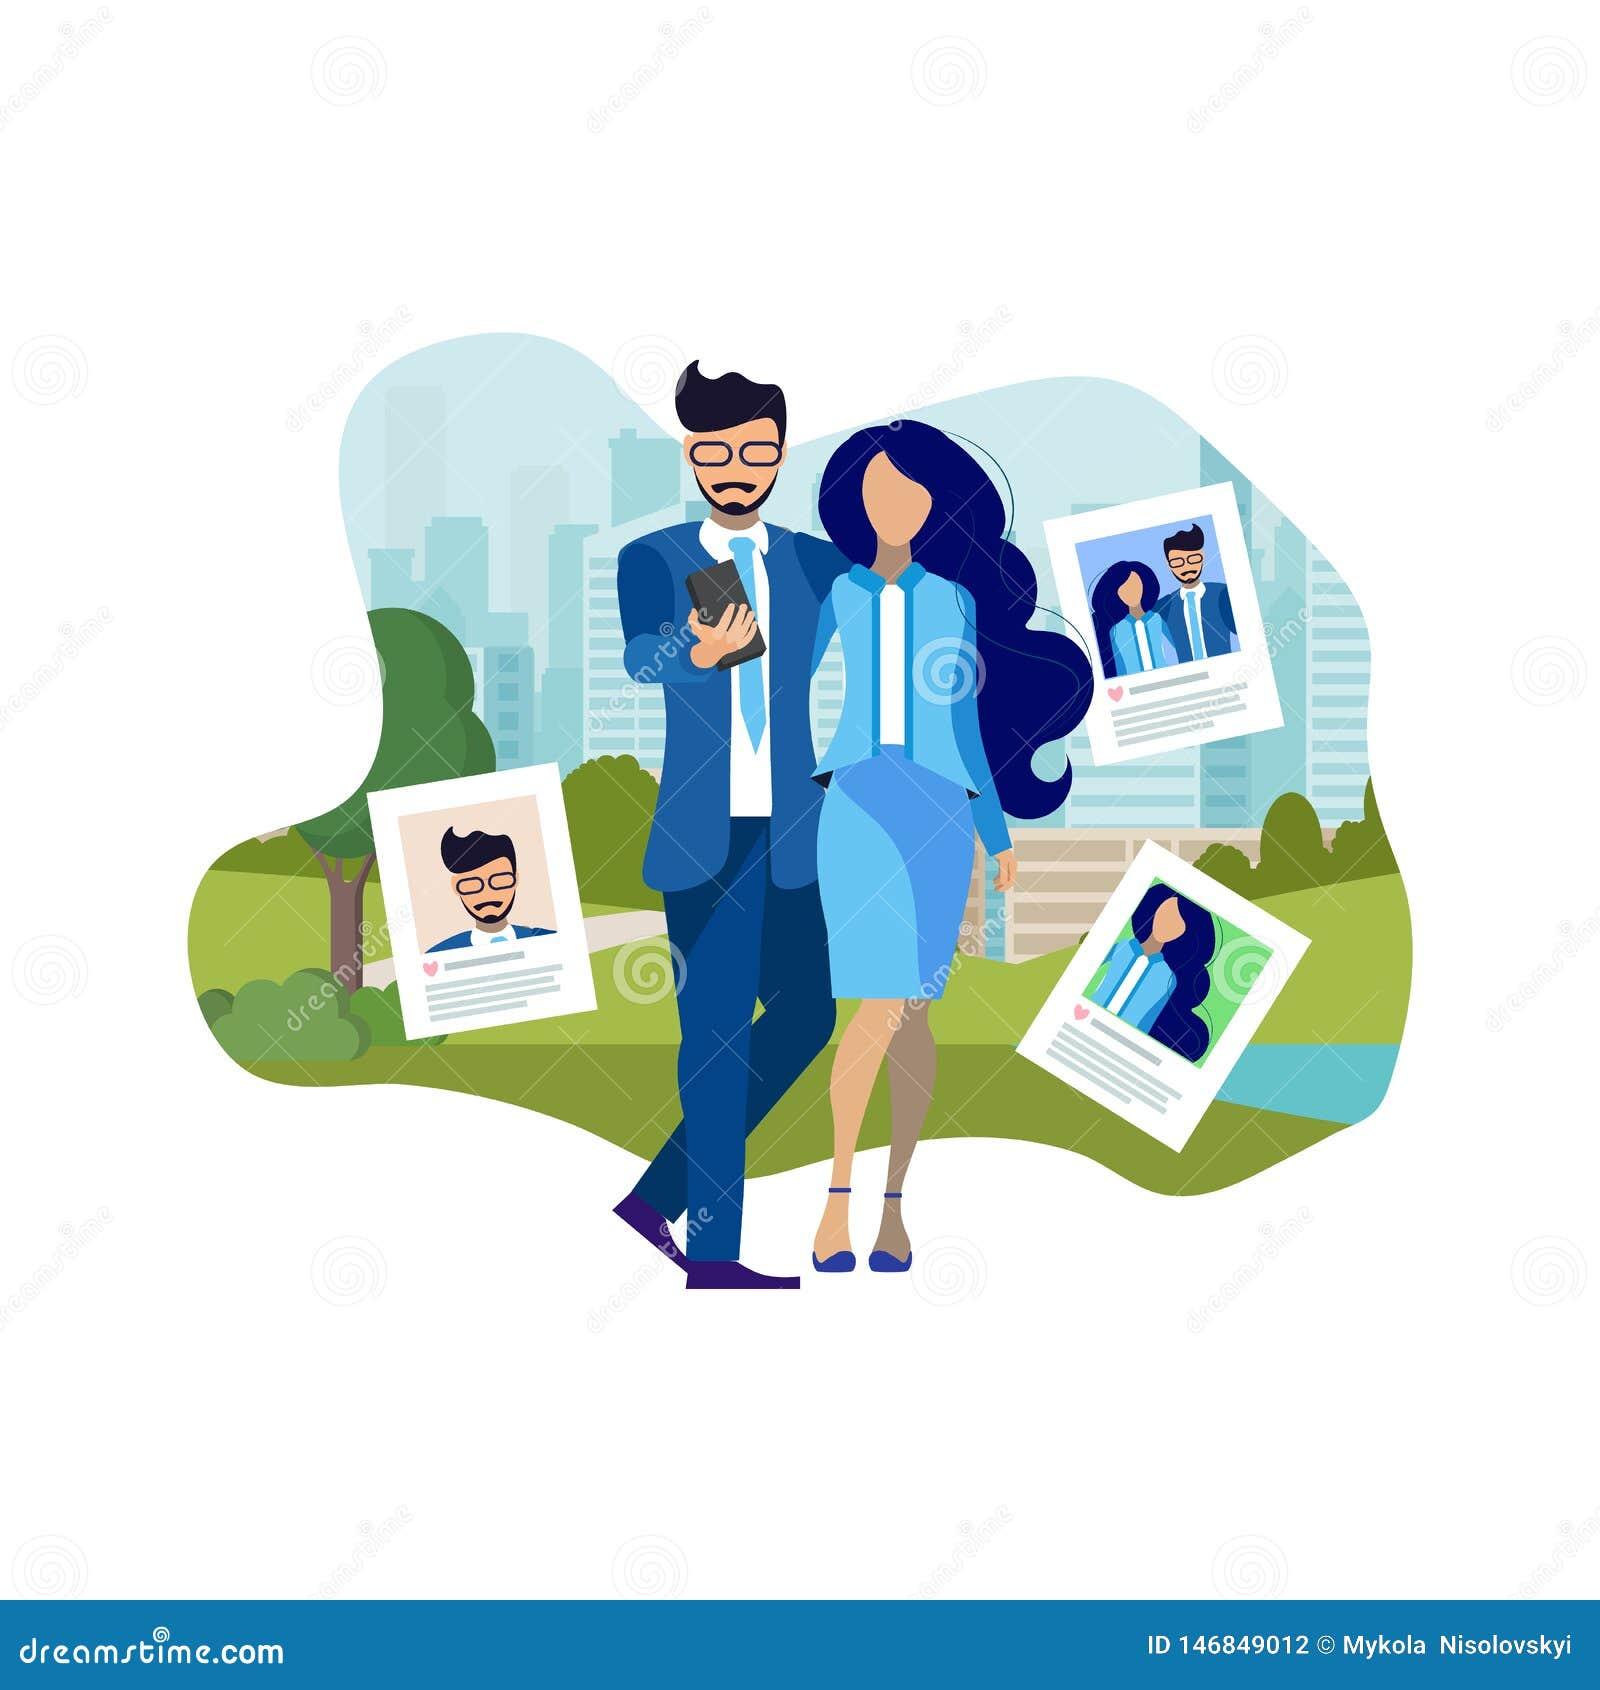 Couple Making Selfie Outdoors Flat Illustration